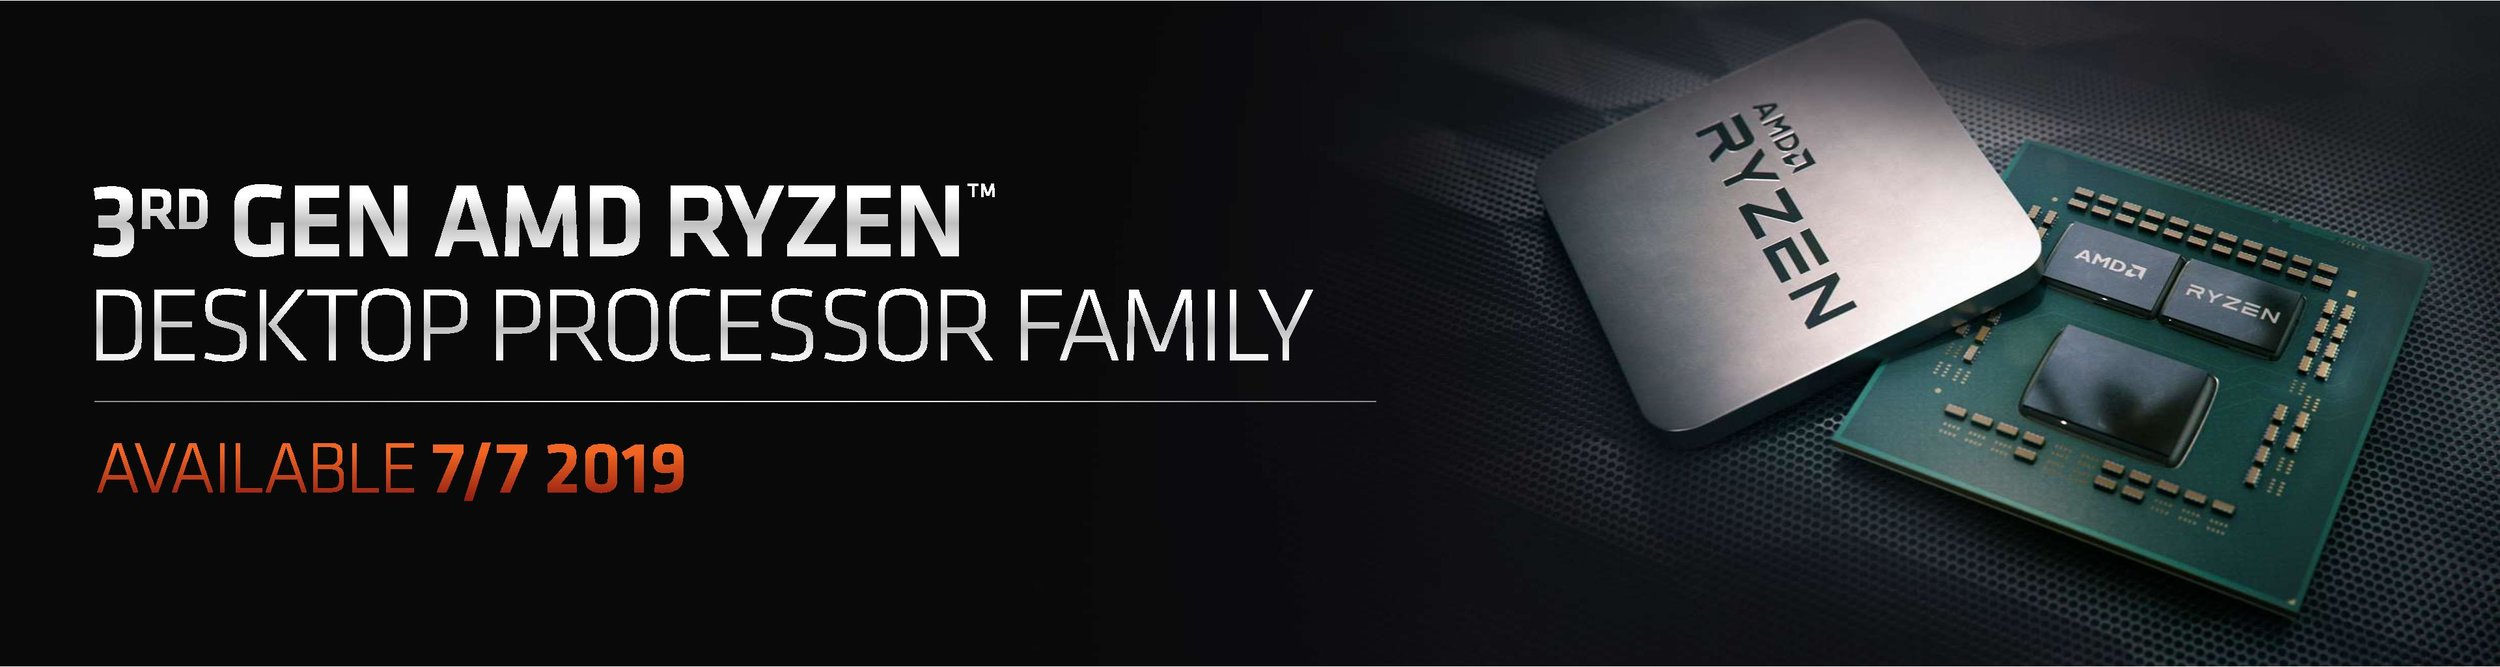 AMD-Ryzen-3000-series.jpg